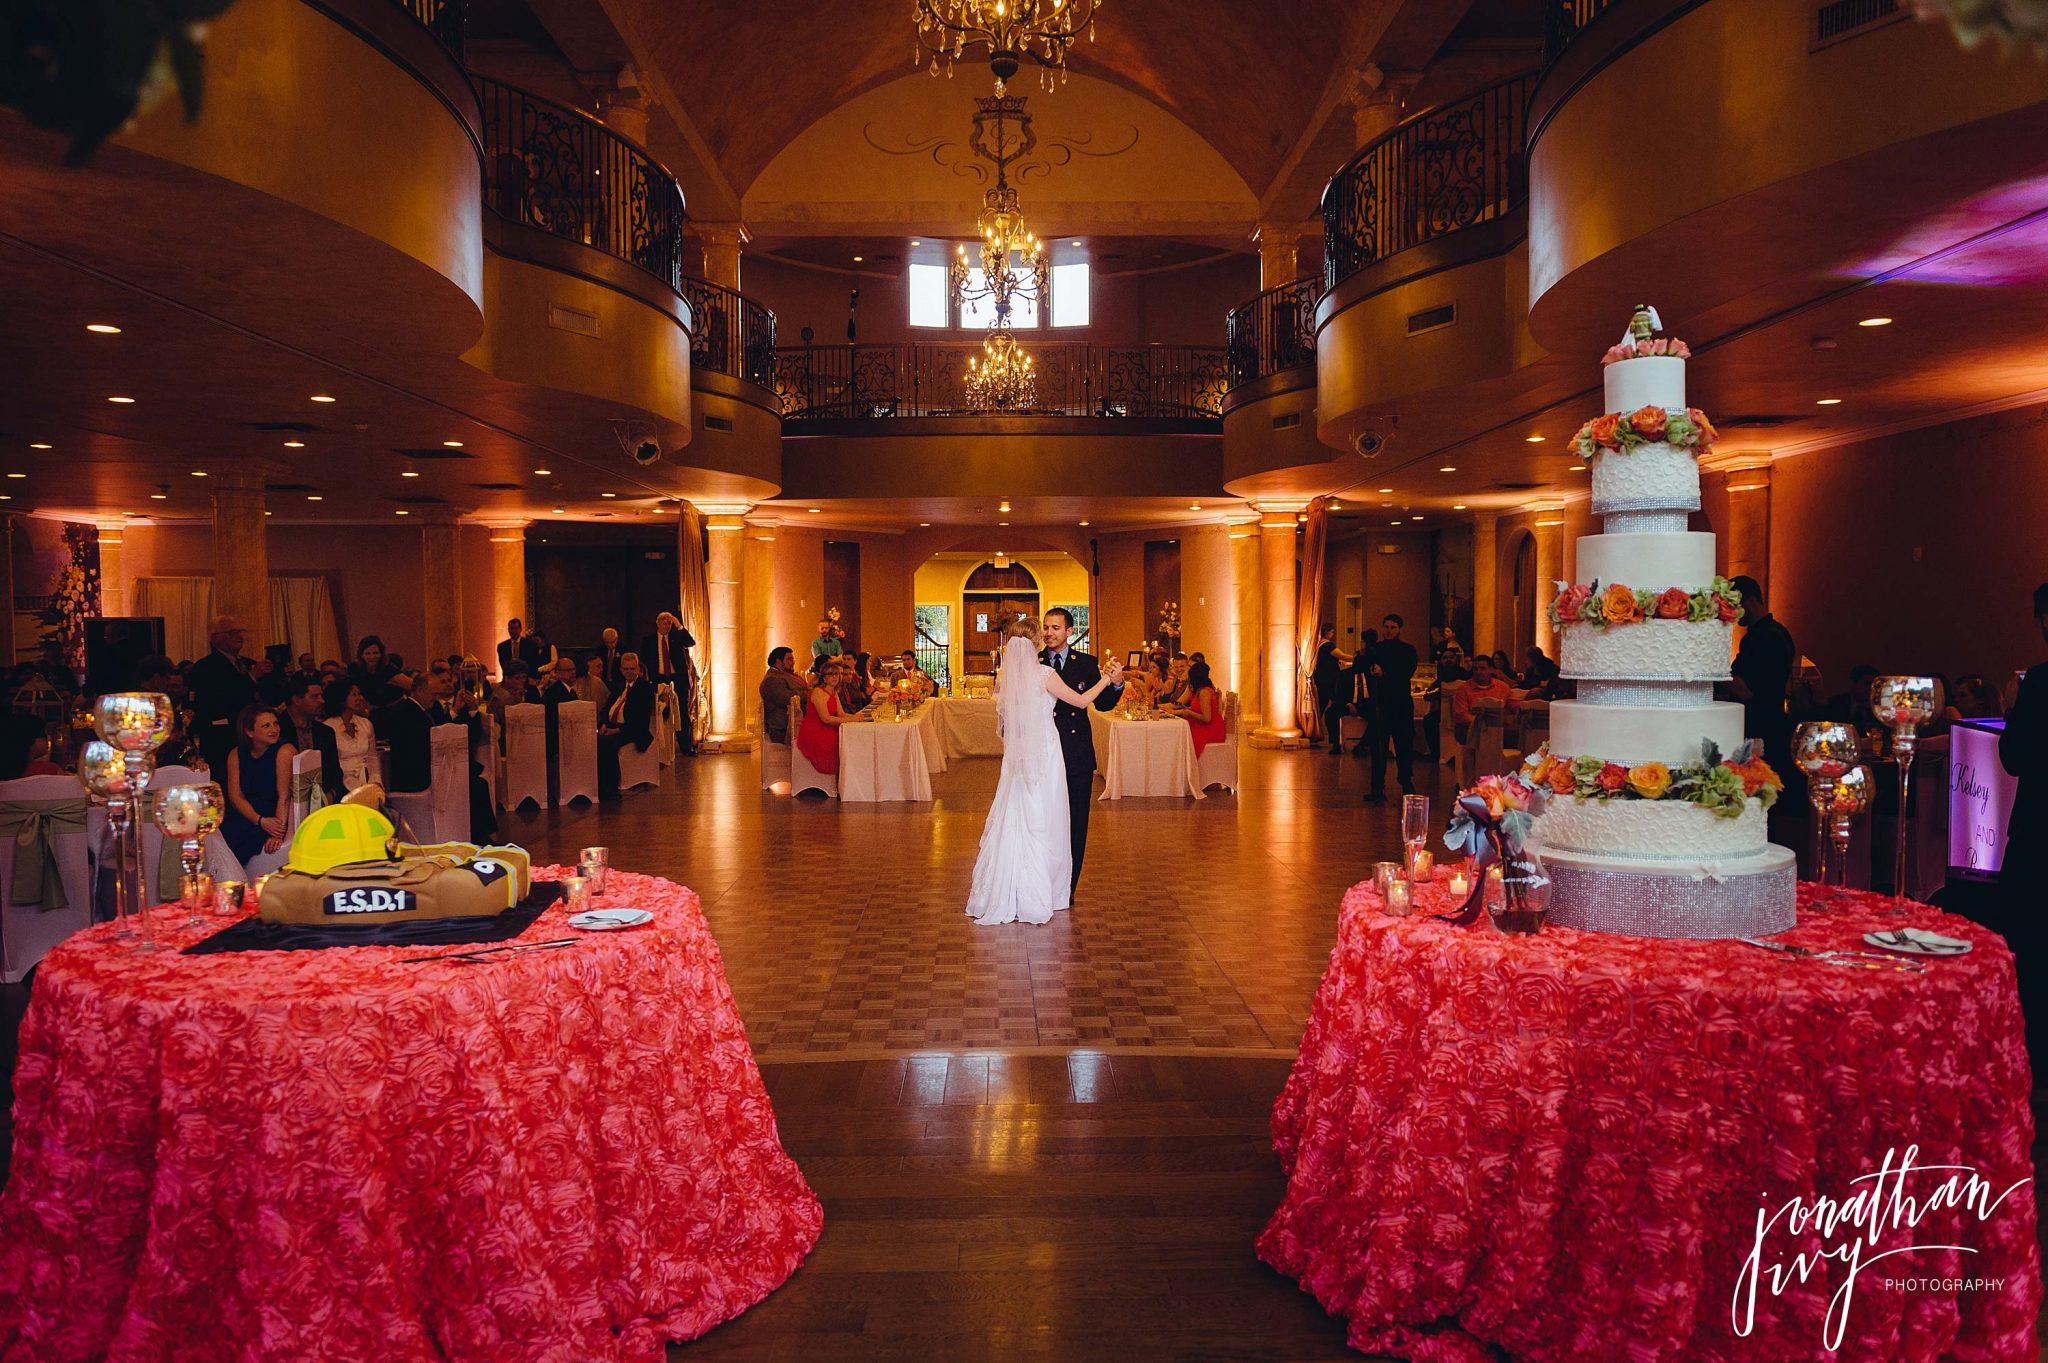 Chateau-polonez-wedding-houston_0036